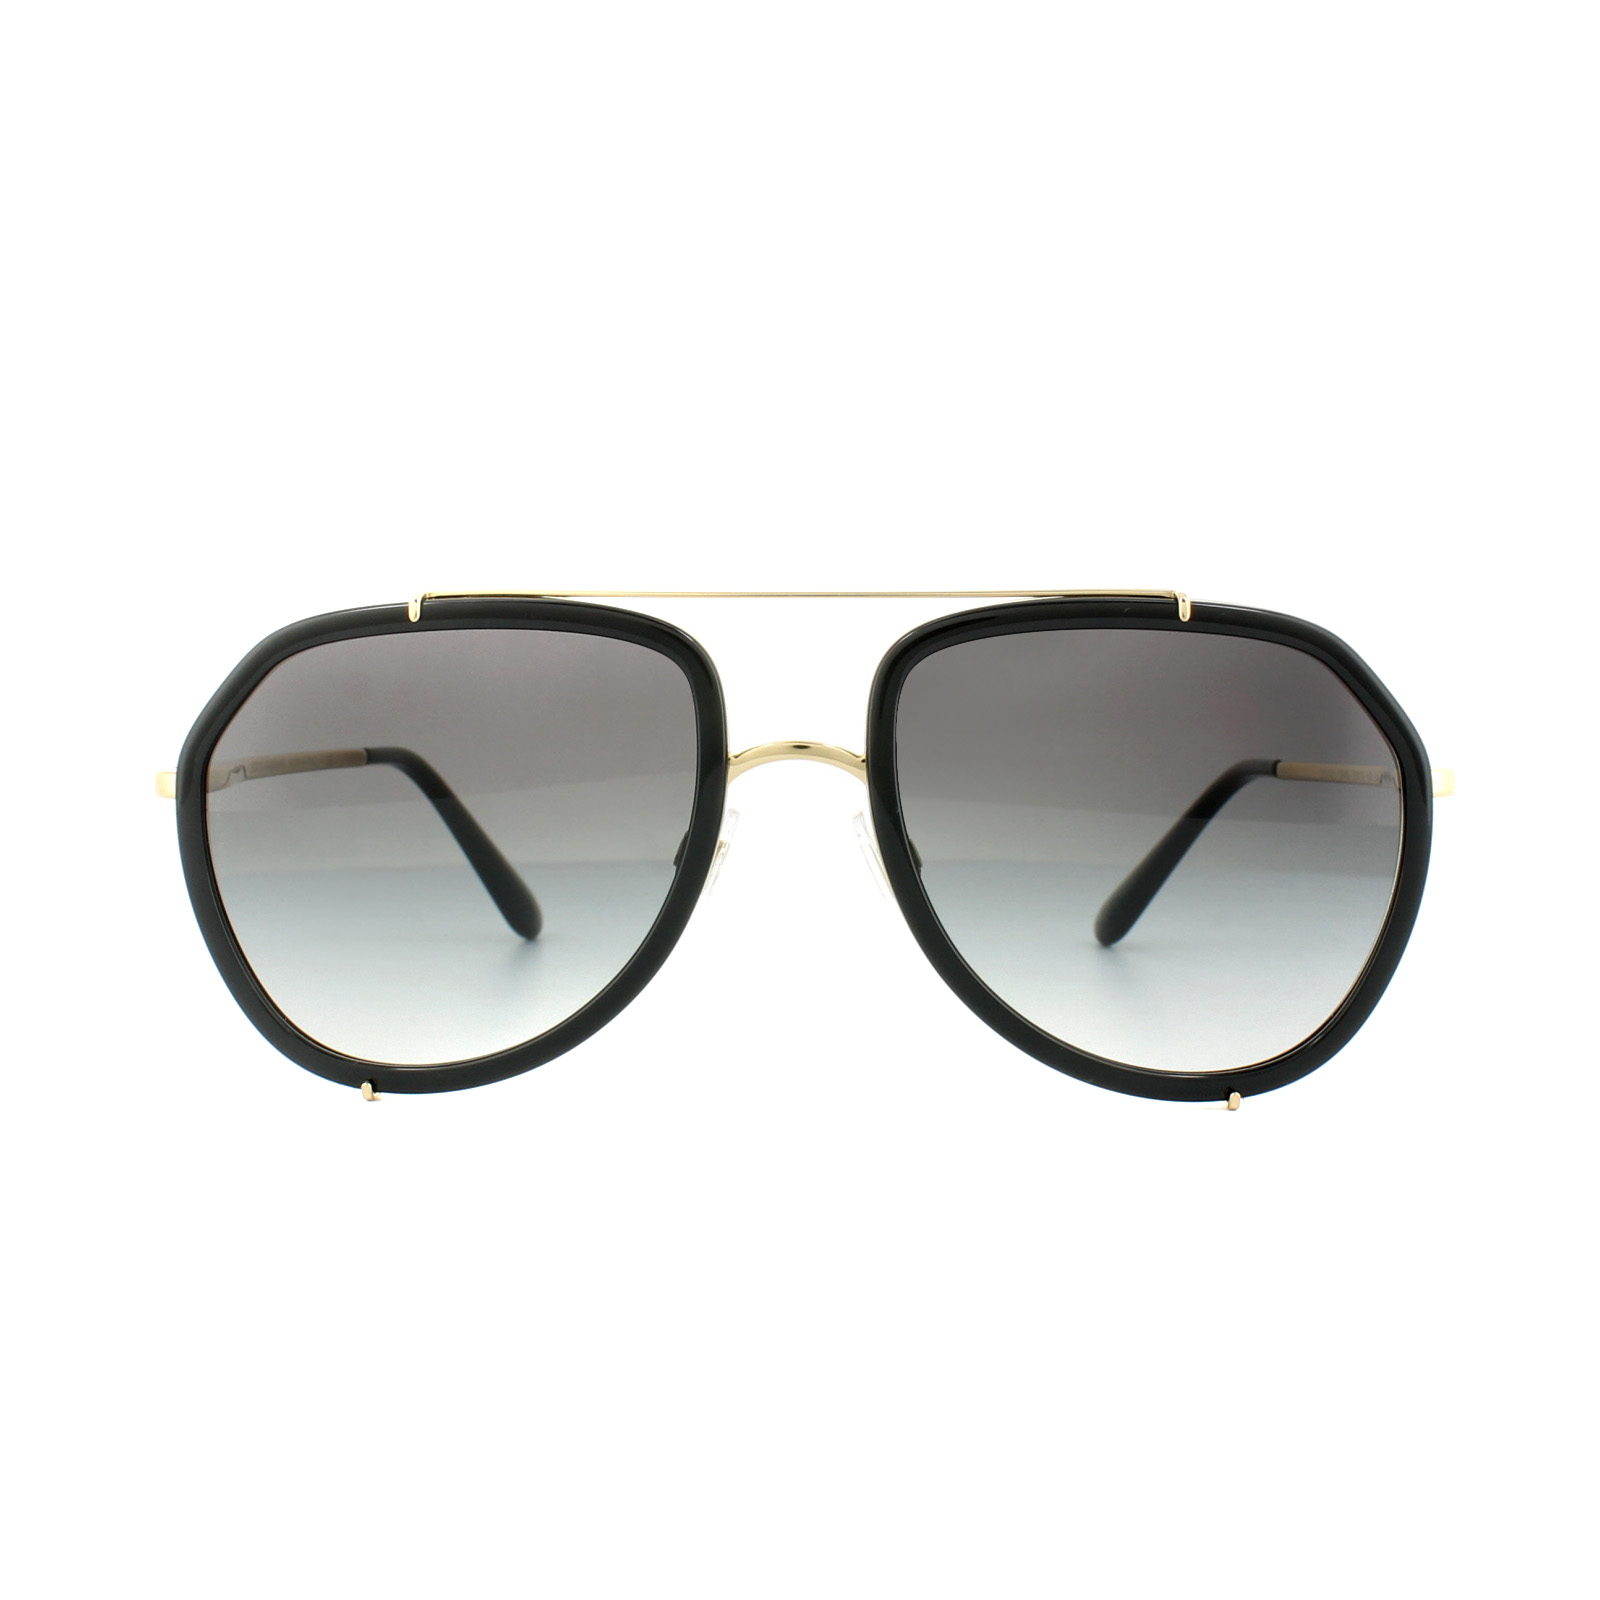 ccf8c6333e ... Dolce and Gabbana 2161 Sunglasses Thumbnail 2 ...